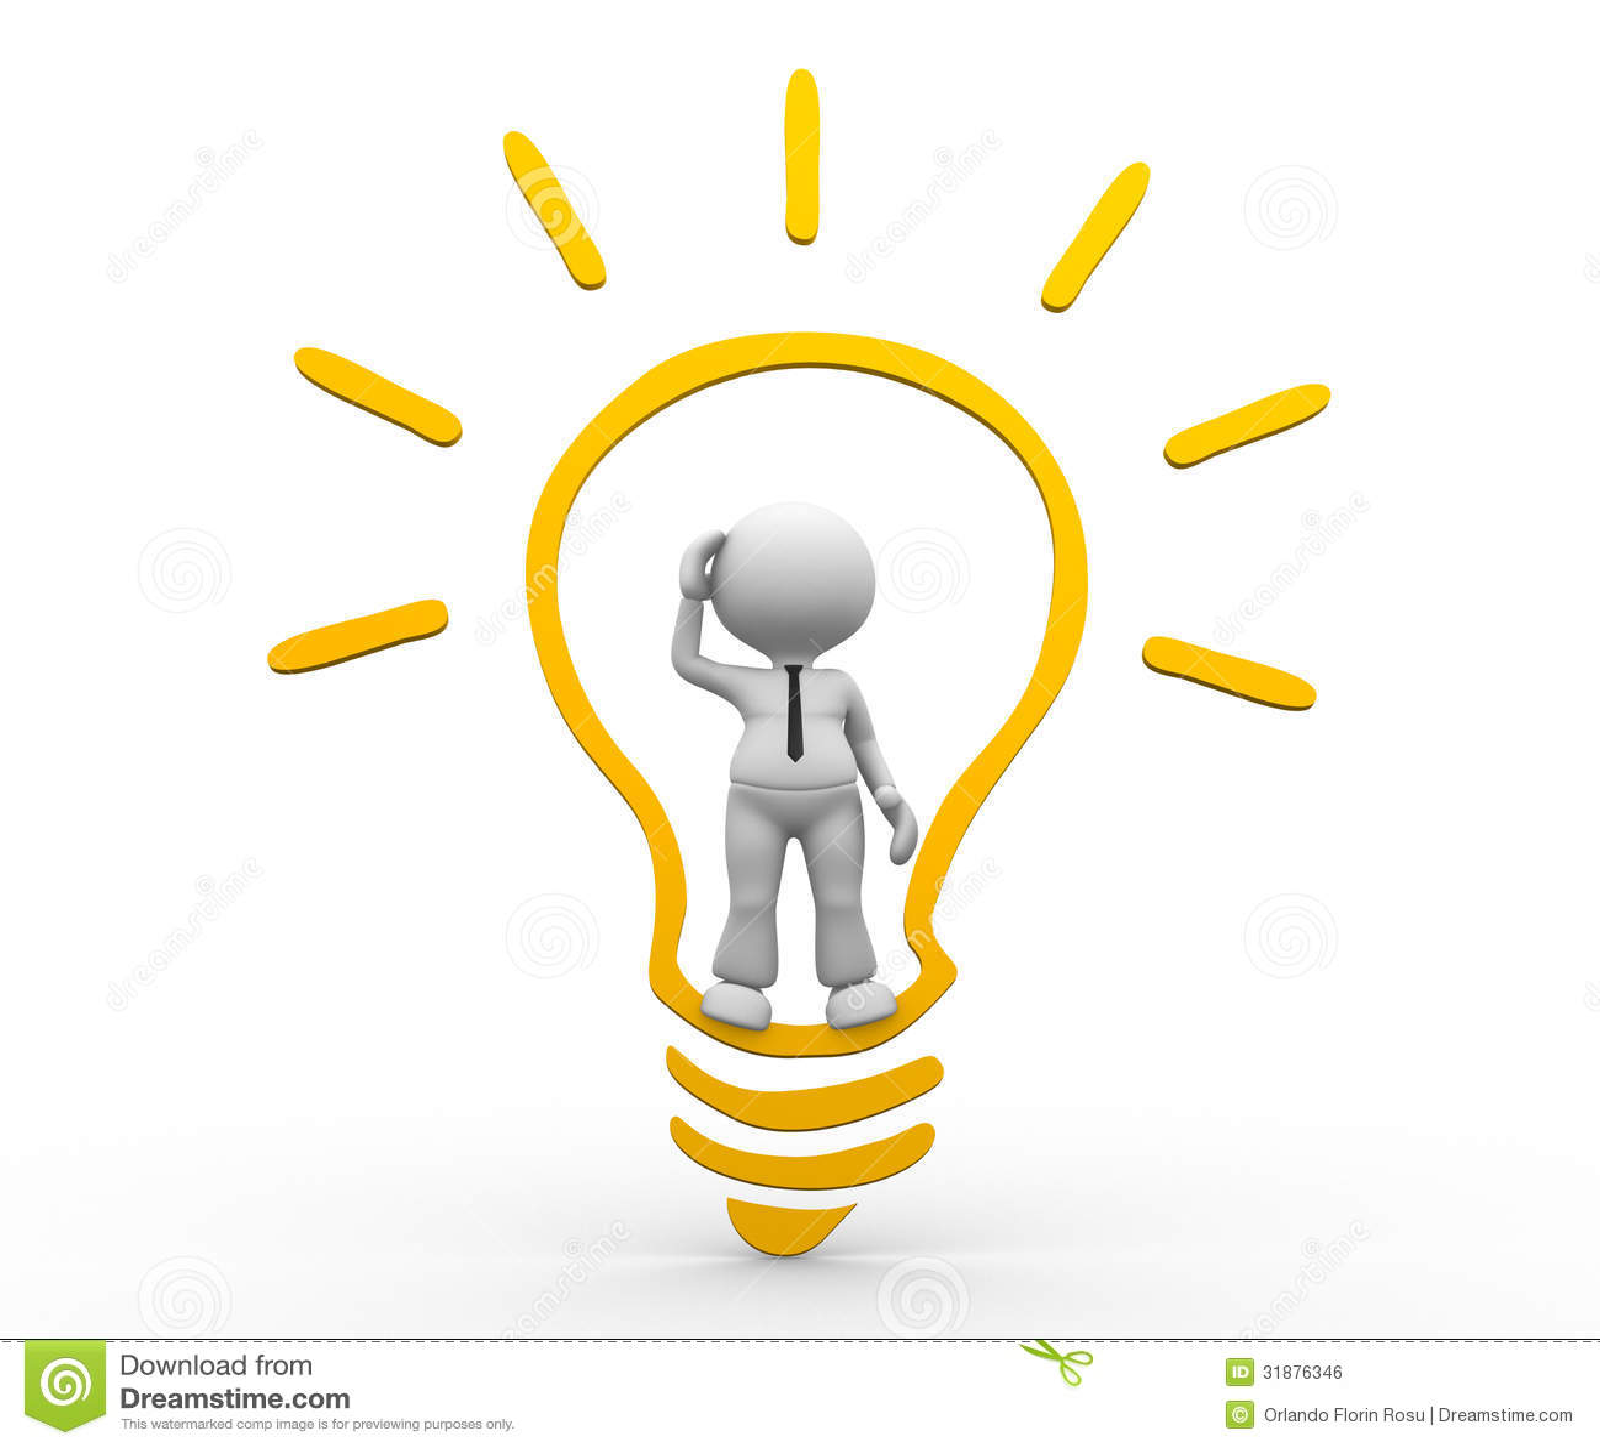 Light Bulb Royalty Free Stock Image - Image: 31876346